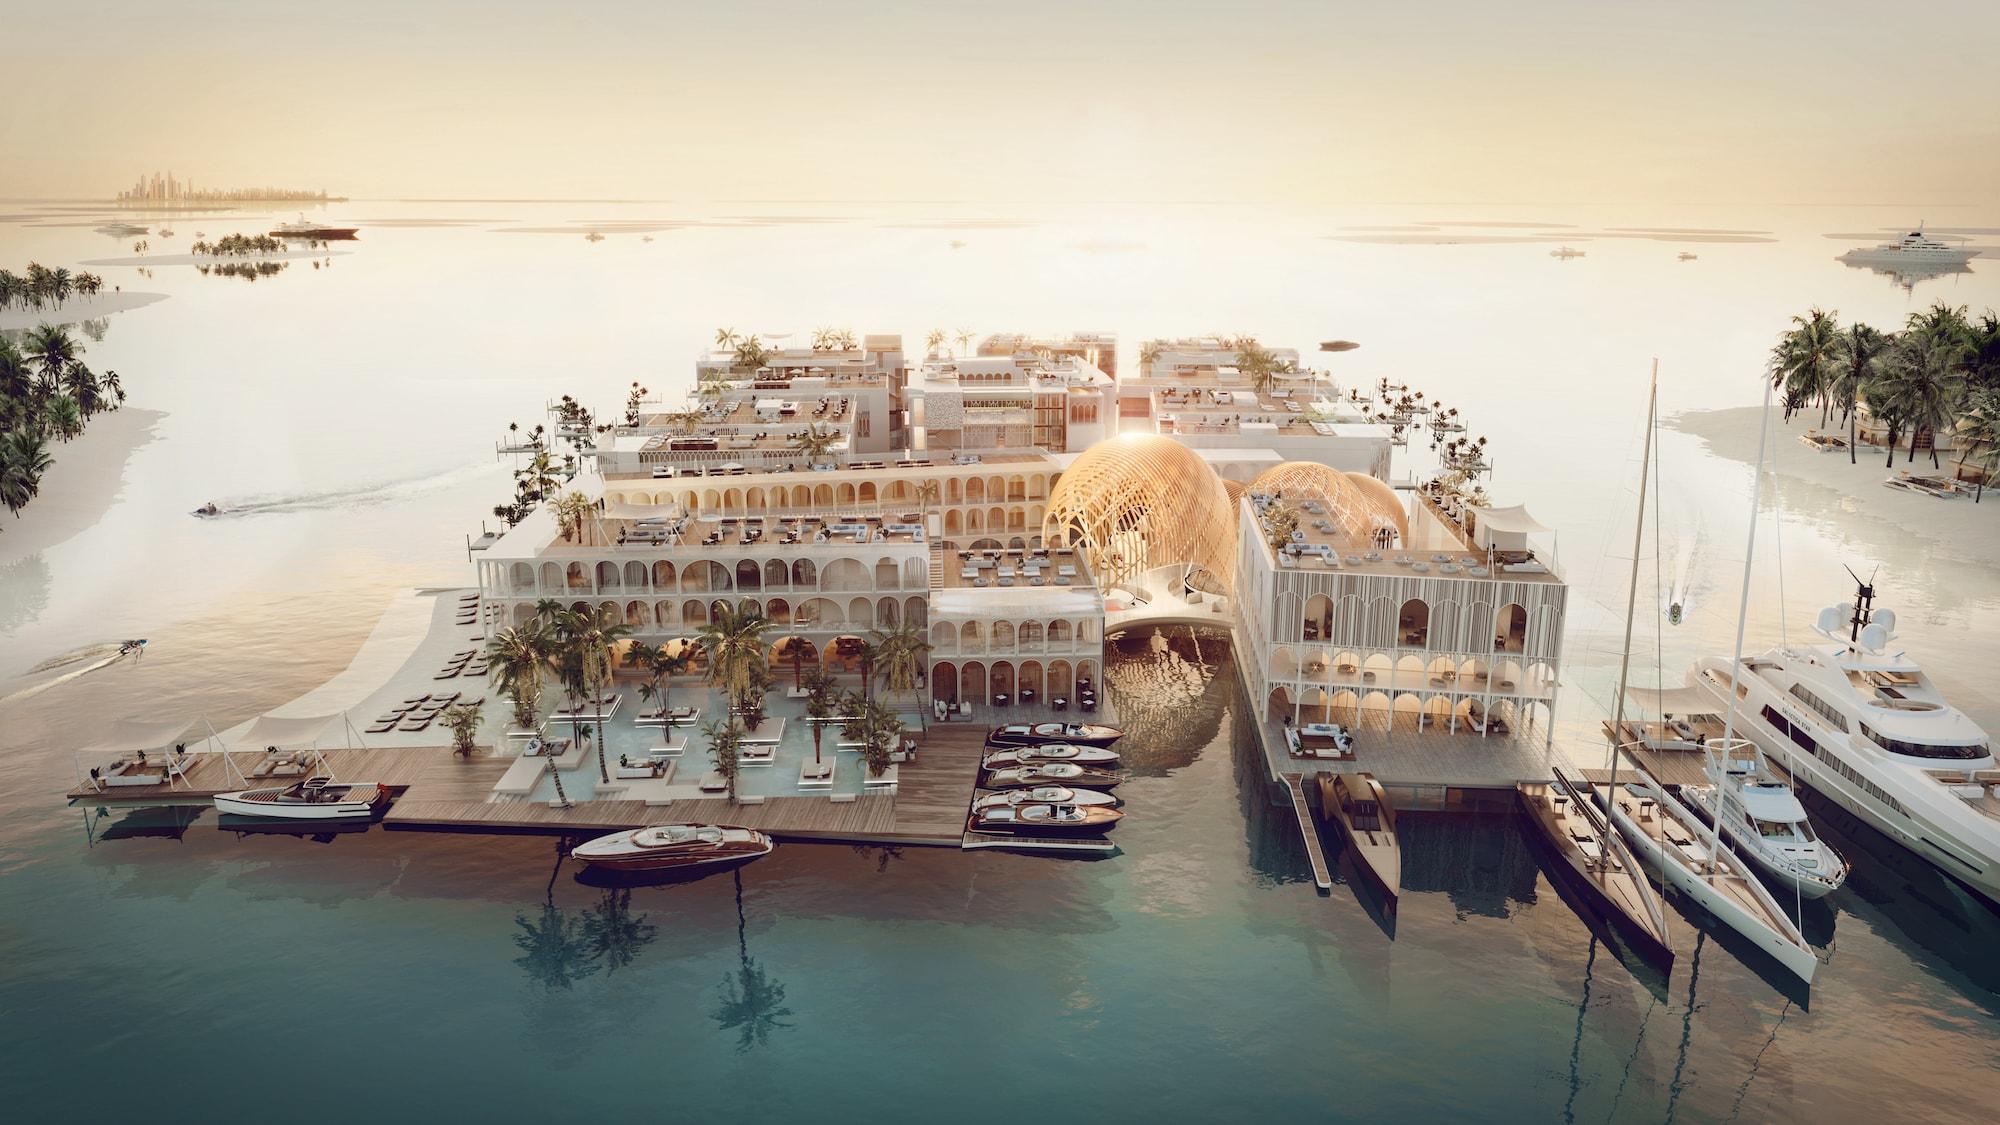 Venedig im Herzen von Dubai: The Floating Venice 2